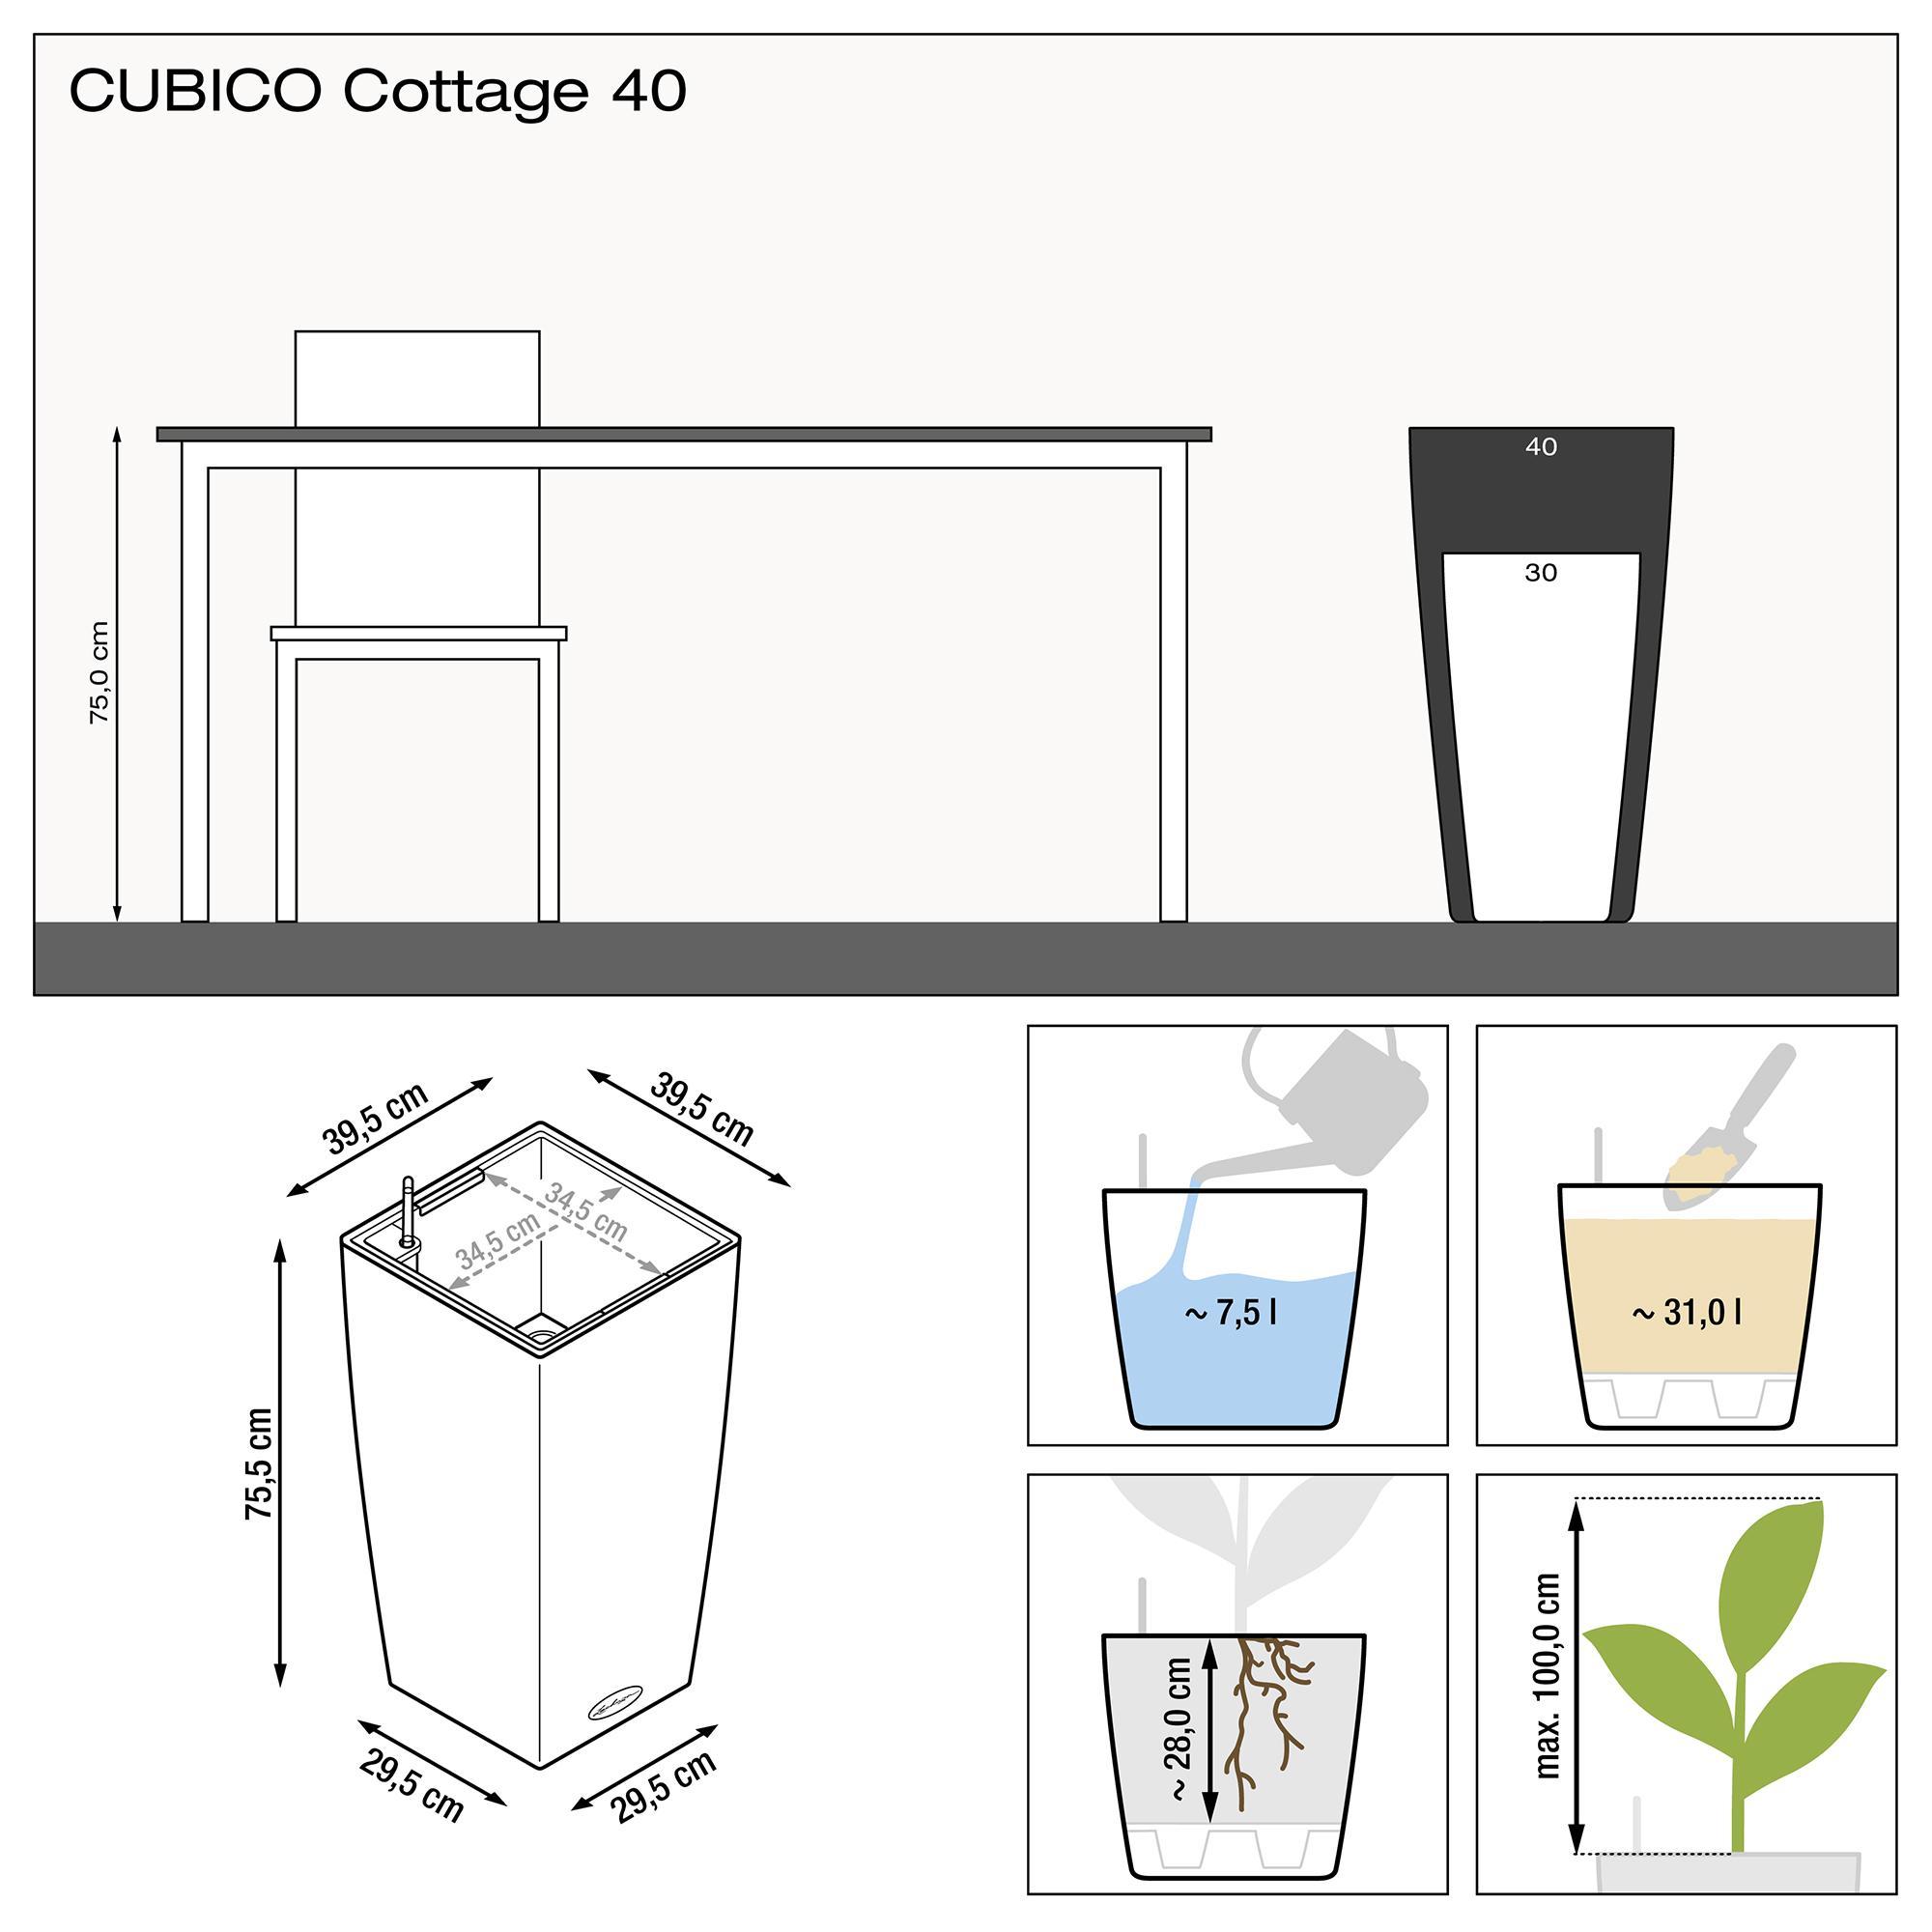 CUBICO Cottage 40 white - Image 3